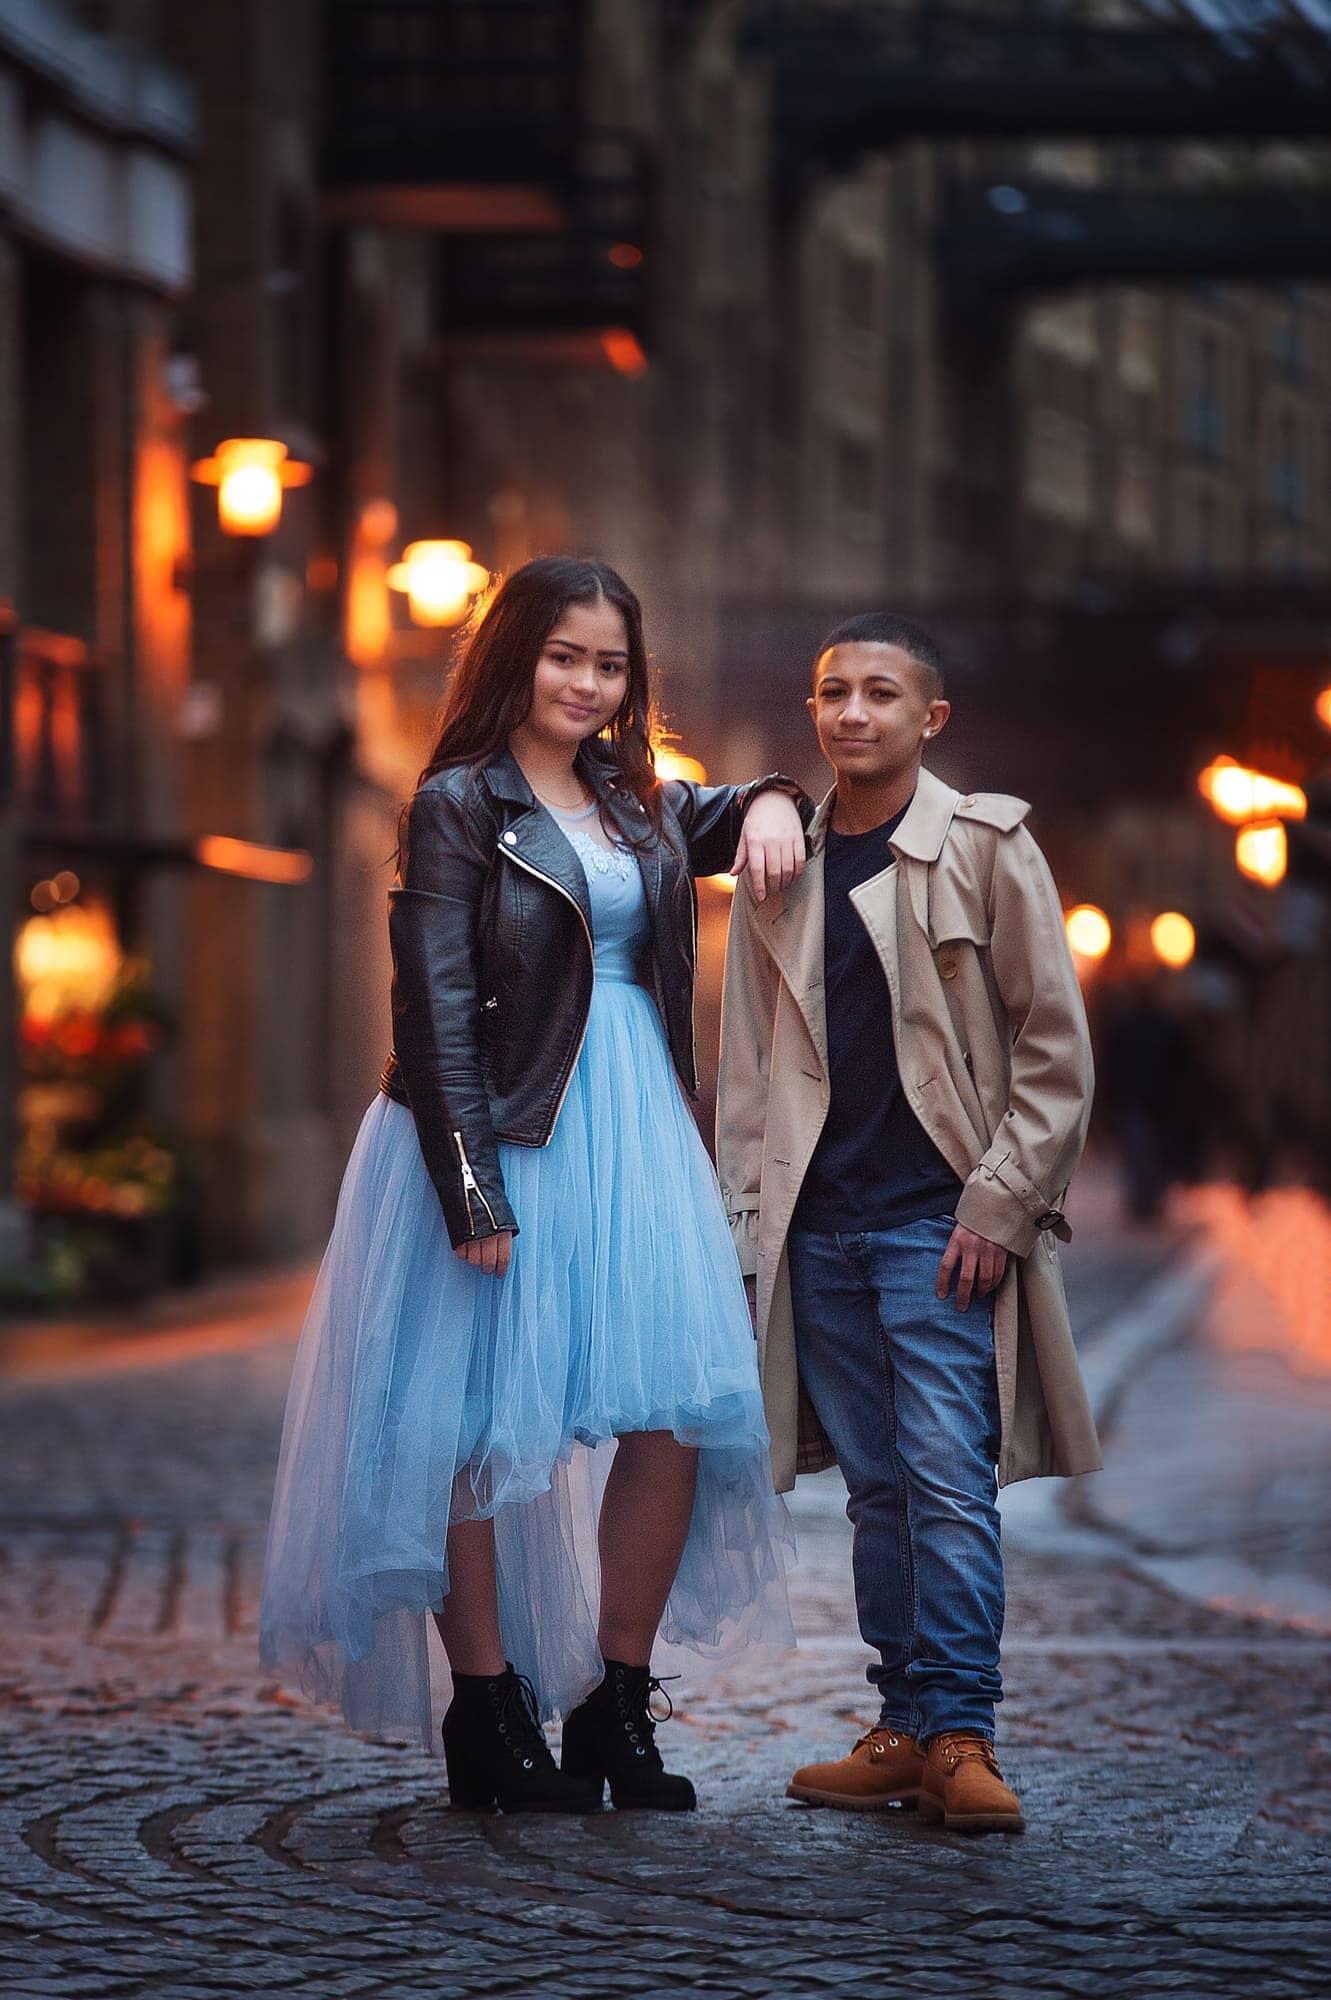 Ashleigh Shea Photography - Oliver & Lili 012